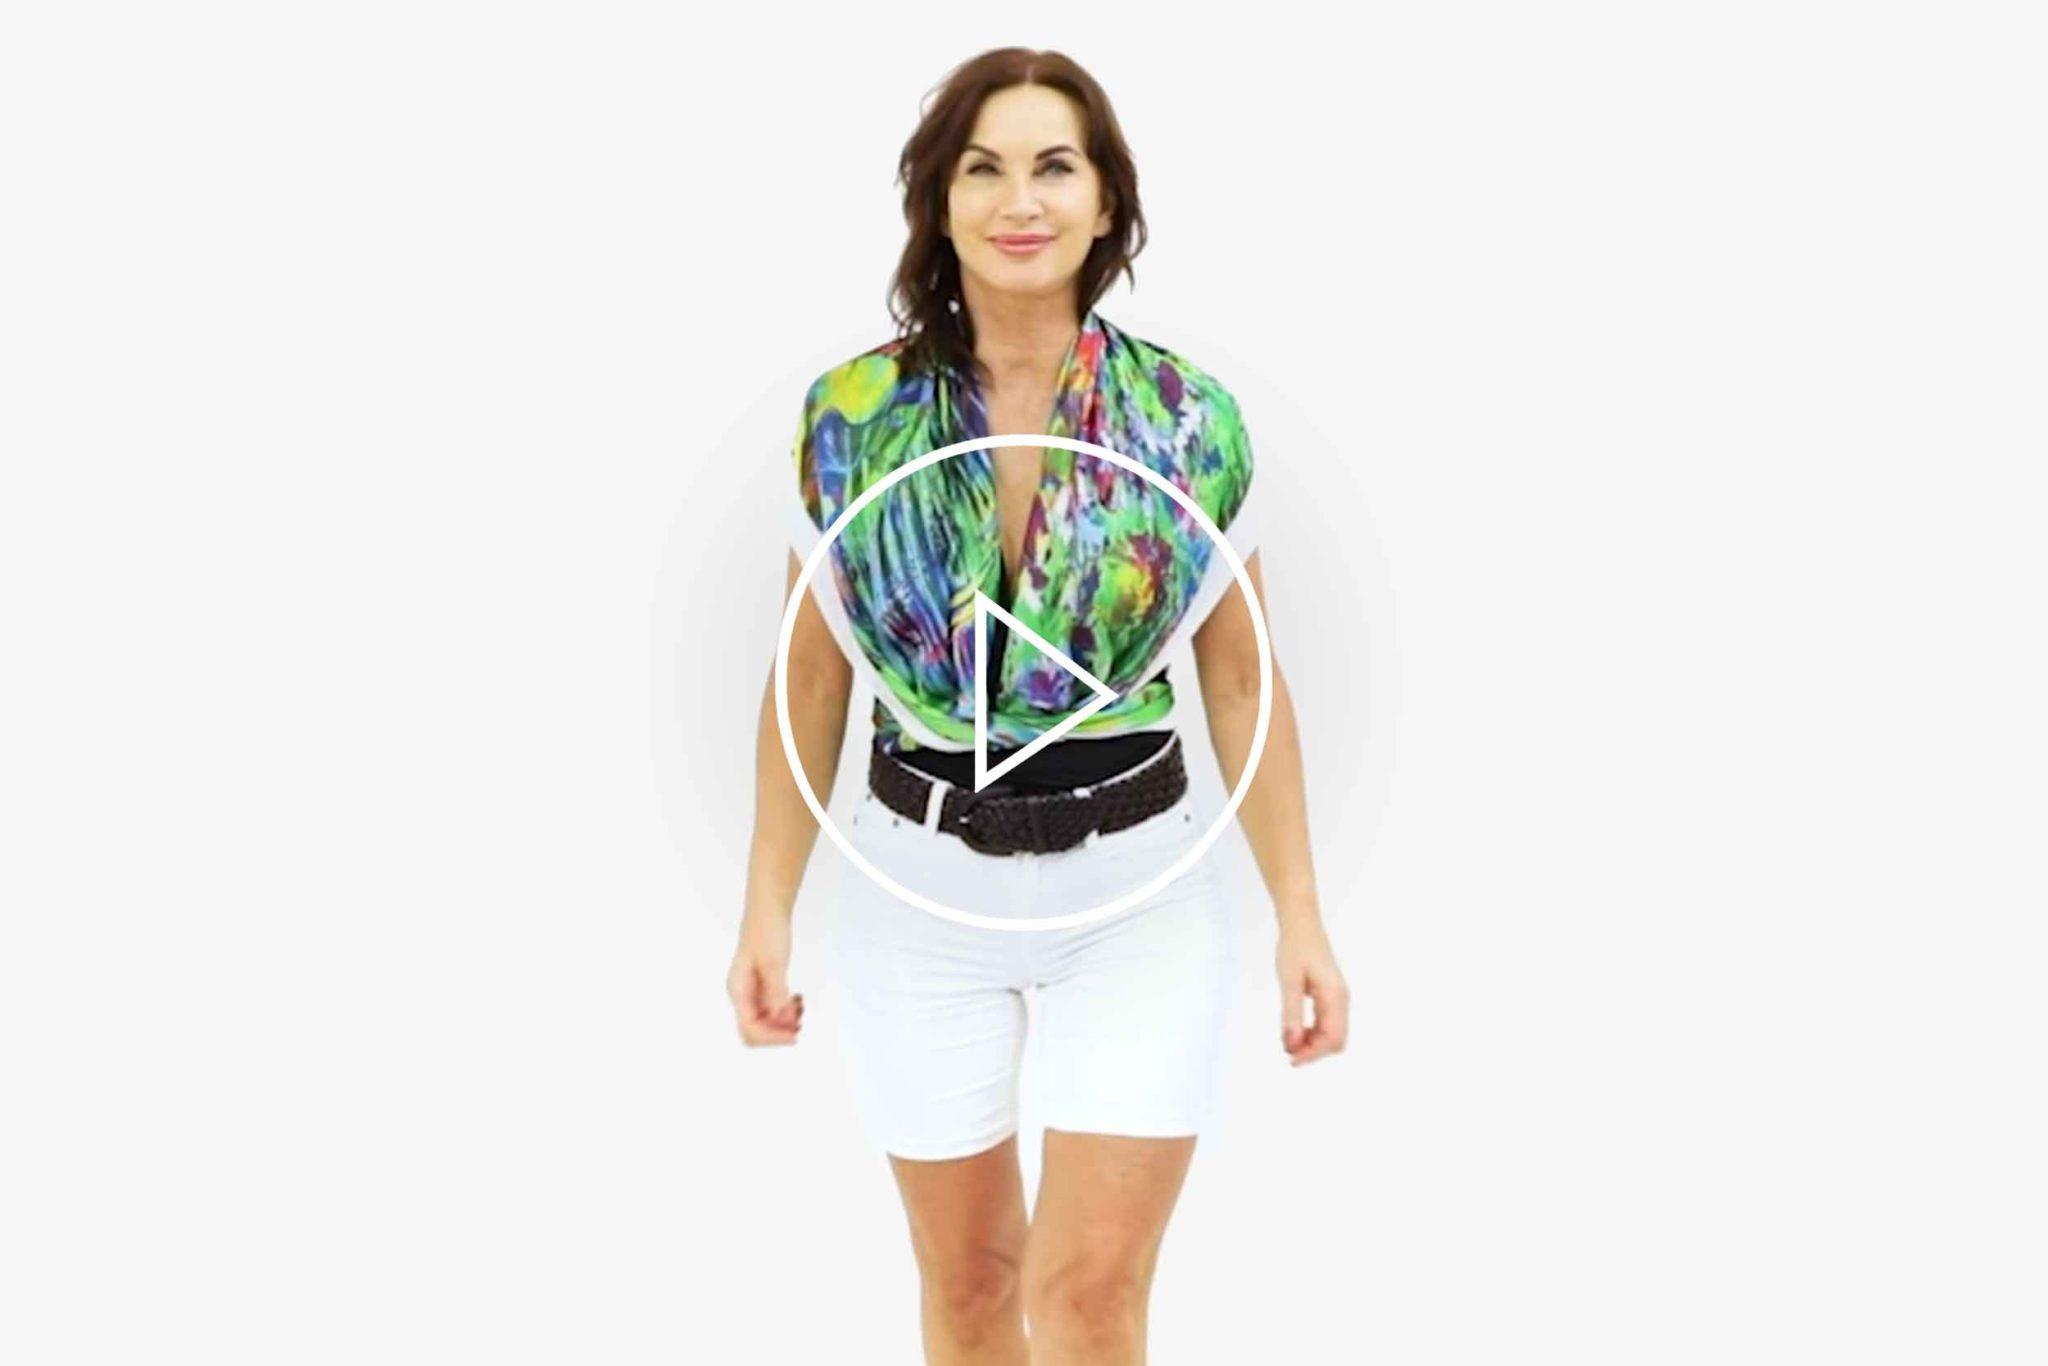 Cornelia Hagmann La Galleria Silk Scarves Styles Inspirations No 10 11 12, Seidenschal, sciarpa di seta, foulard soie,